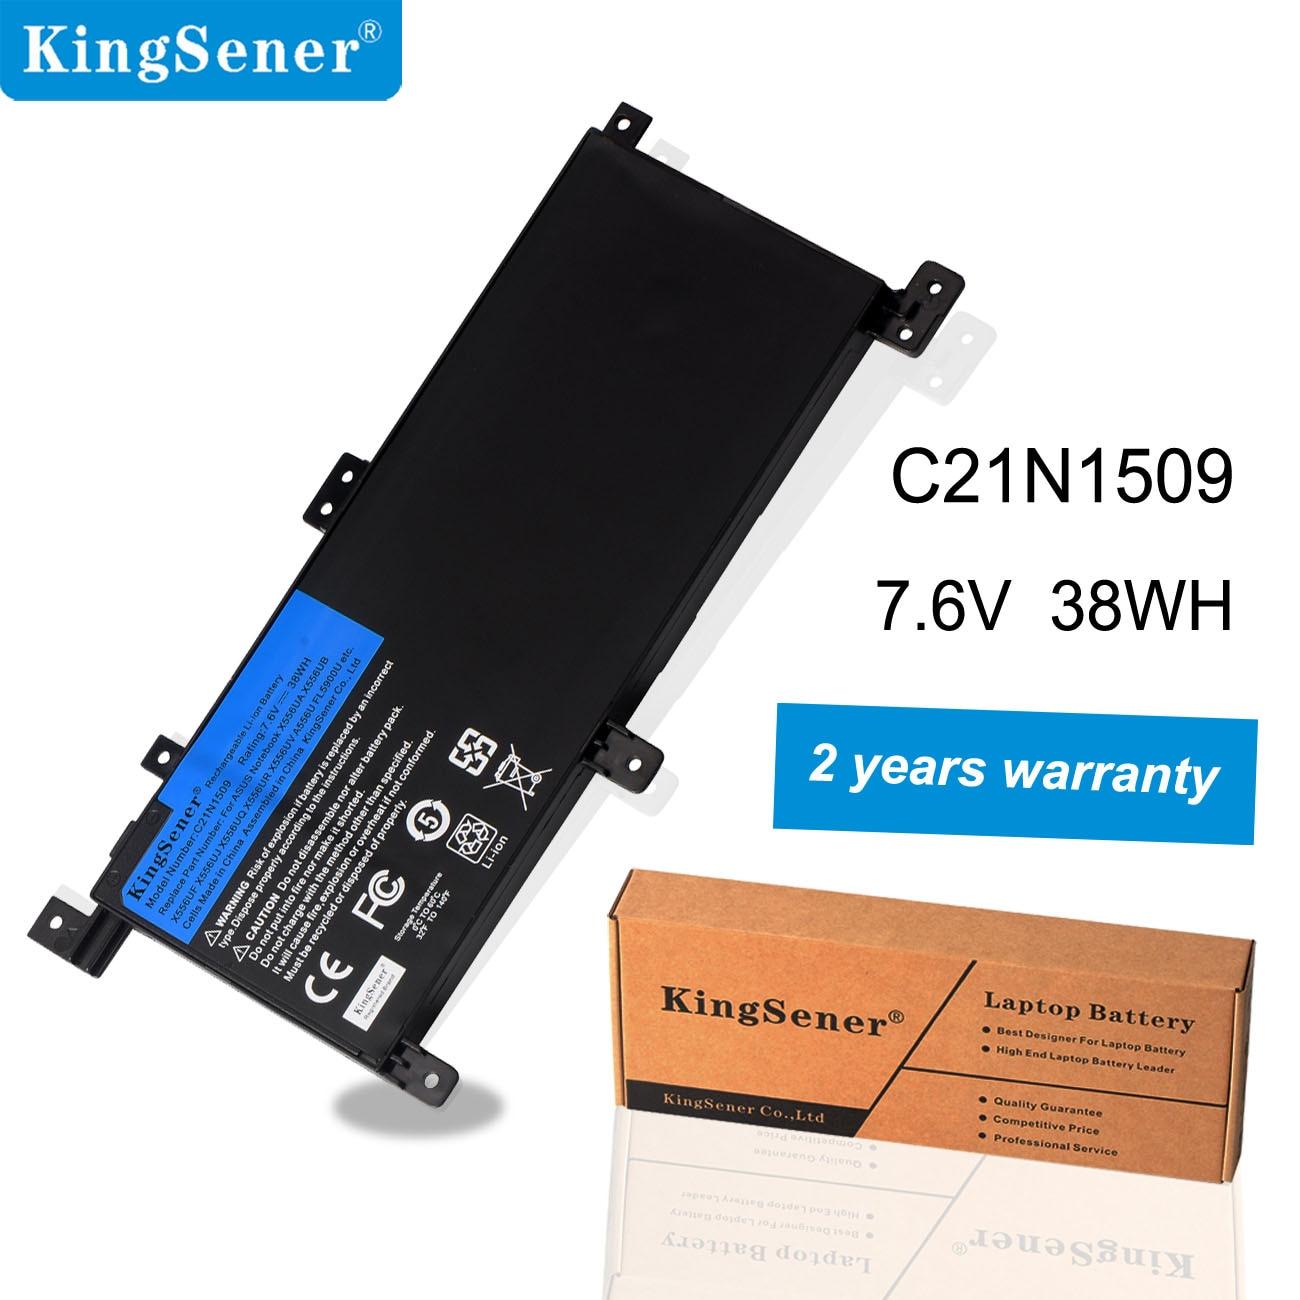 KingSener New C21N1509 Laptop battery for ASUS Notebook X556UA X556UB X556UF X556UJ X556UQ X556UR X556UV A556U FL5900U